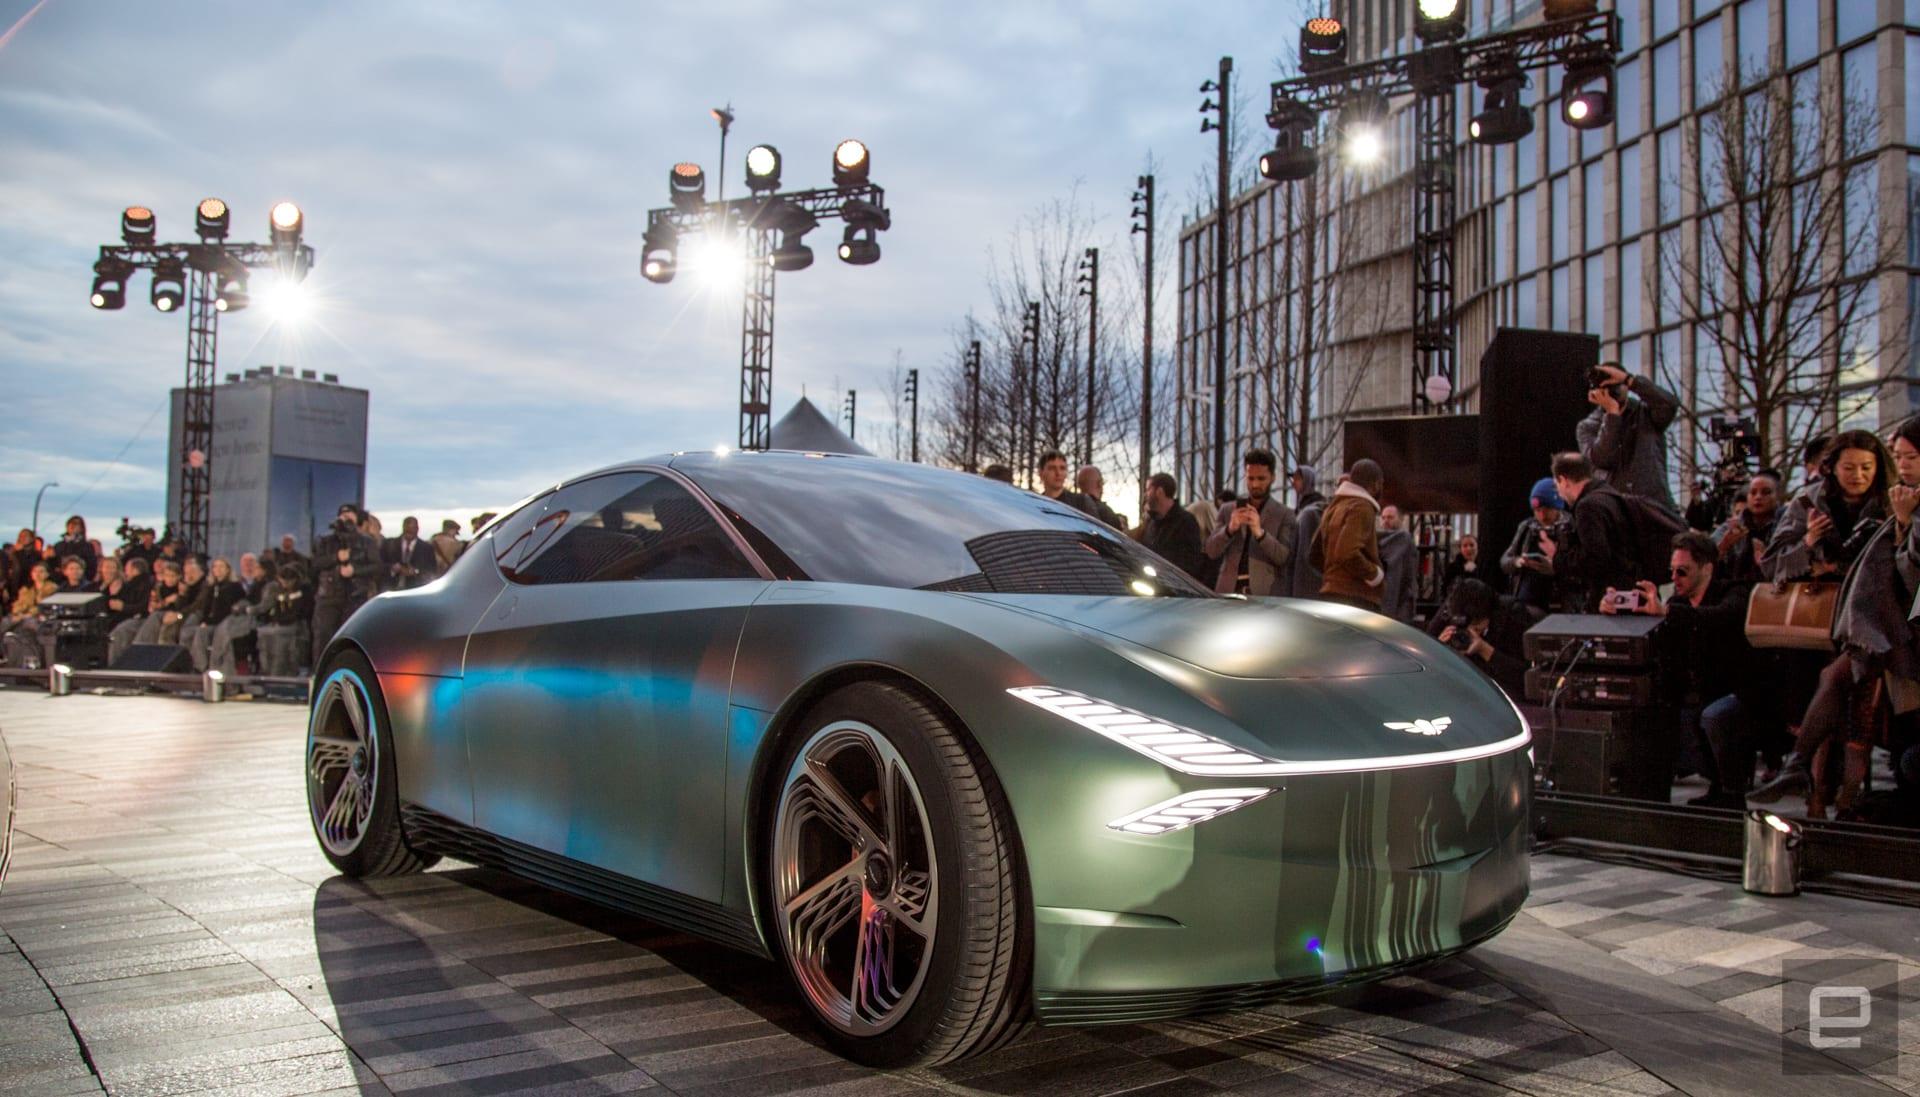 dims?resize=2000%2C2000%2Cshrink&image_uri=https%3A%2F%2Fs.yimg Genesis unveils Mint concept EV for urban fashionistas